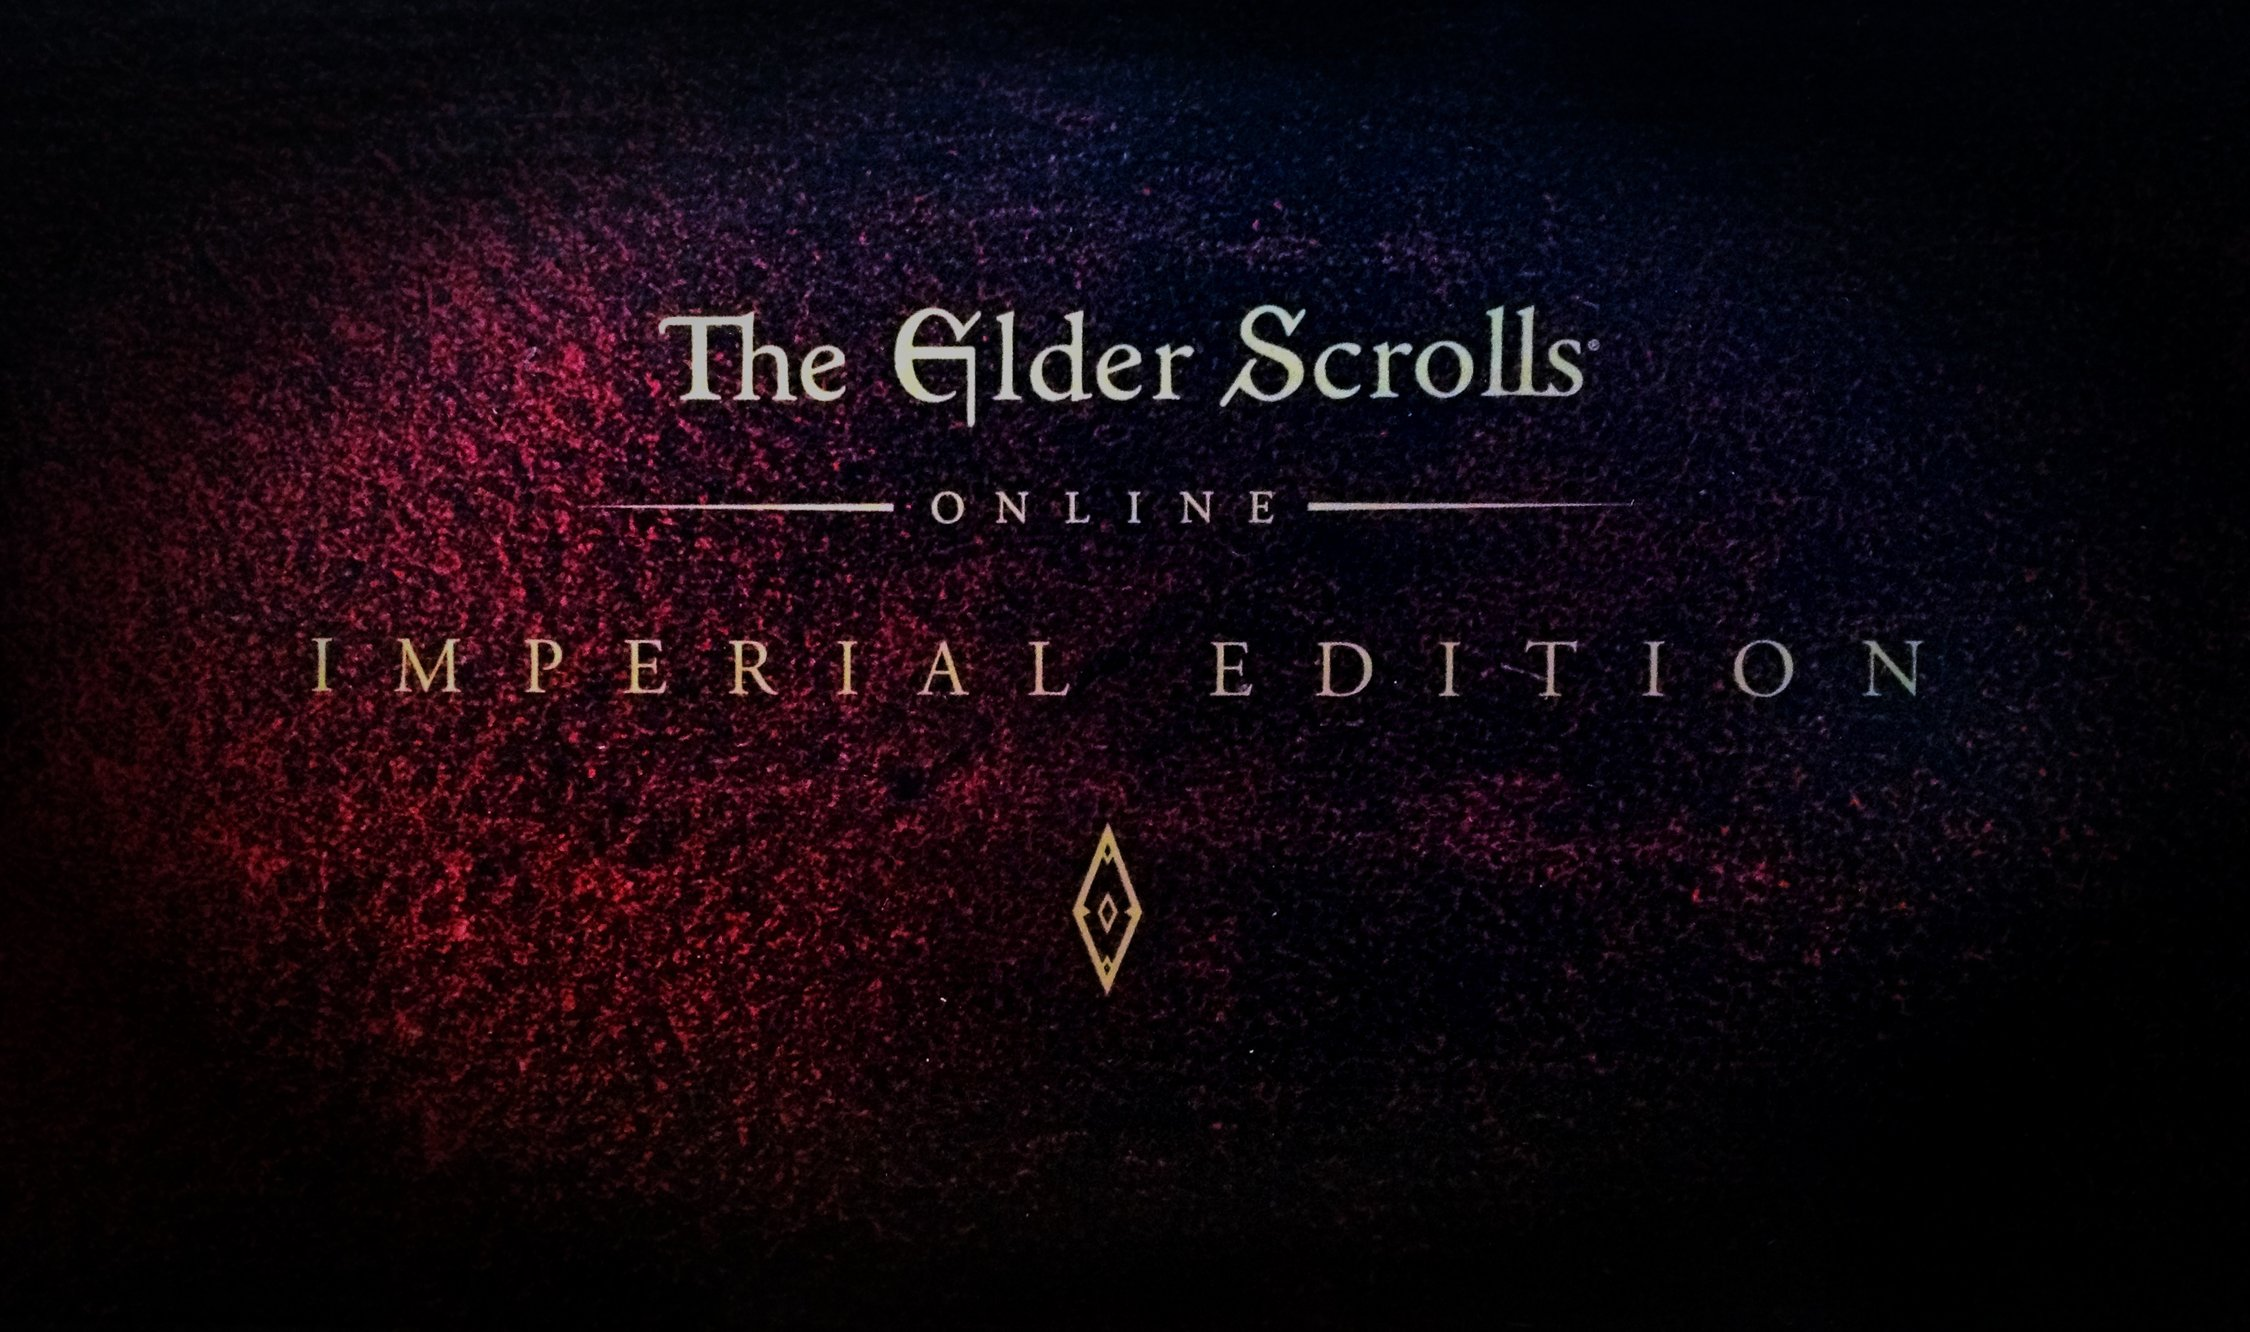 The Elder Scrolls Online Tamriel Unlimited PS4 - Gameplay ...